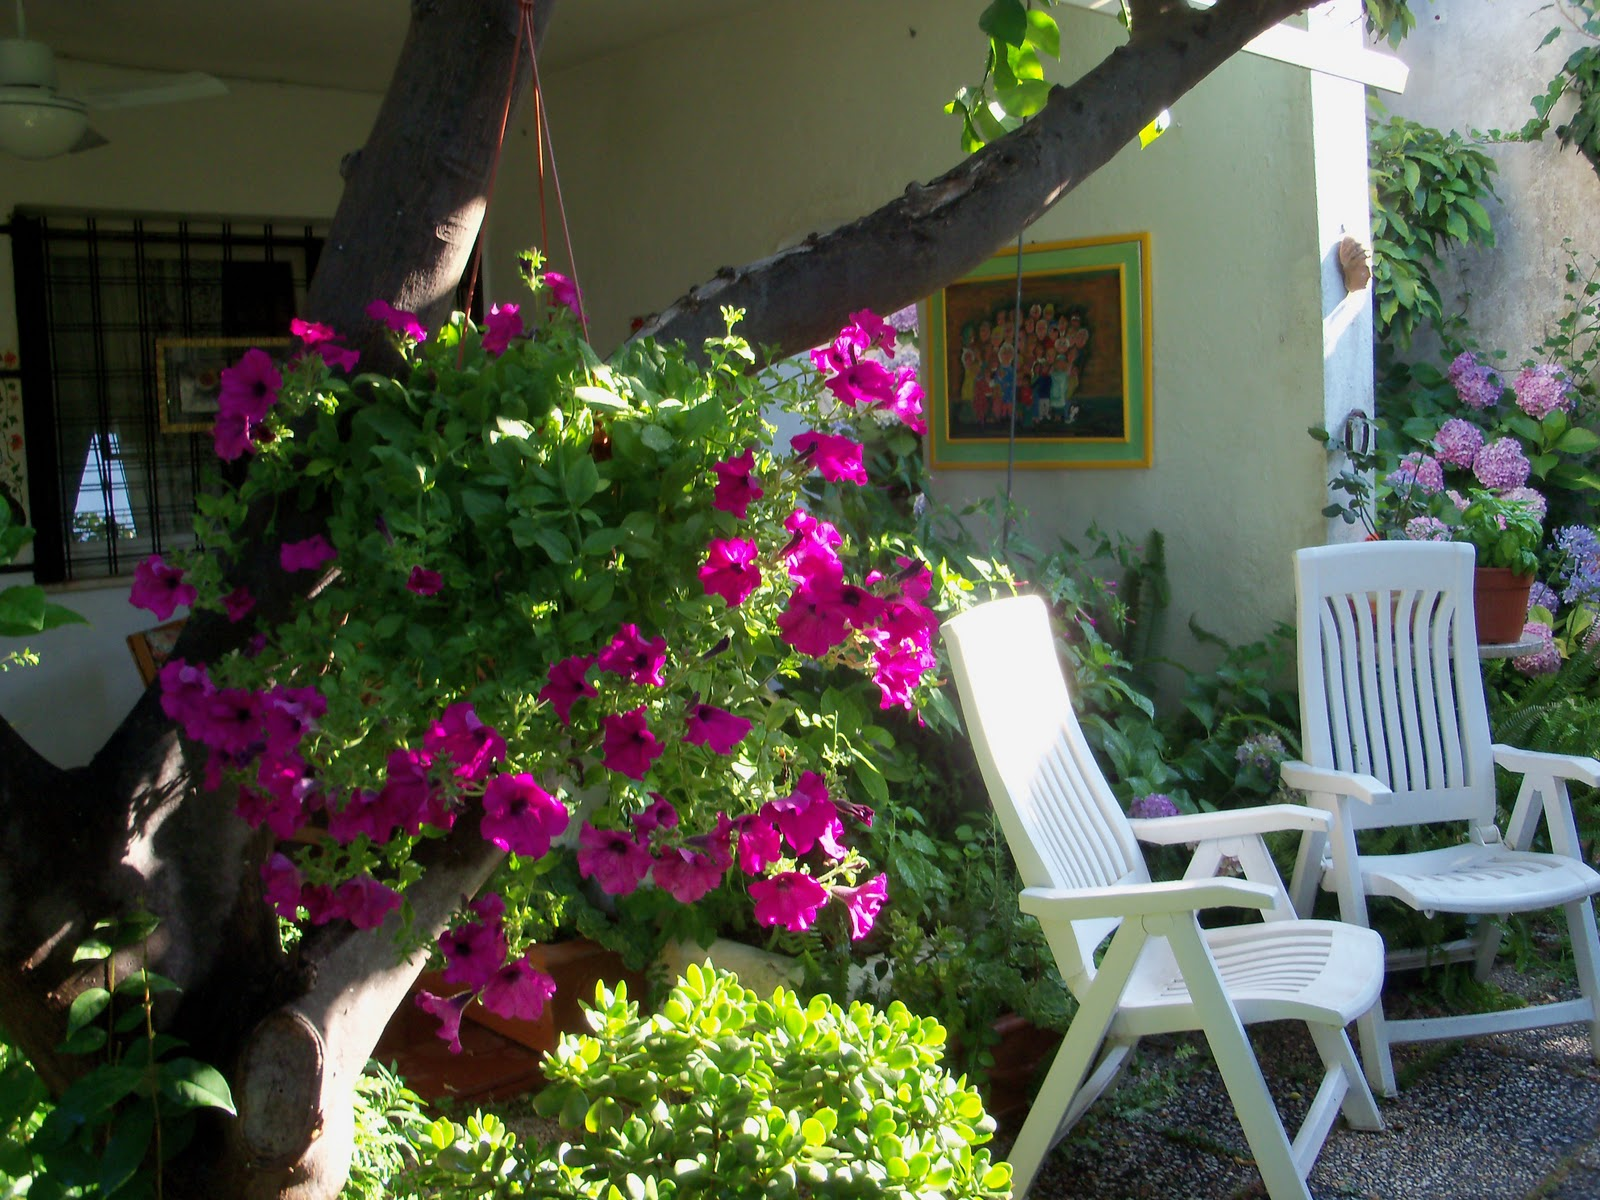 Fantasia tunni il mio giardino fiorito for Giardino fiori